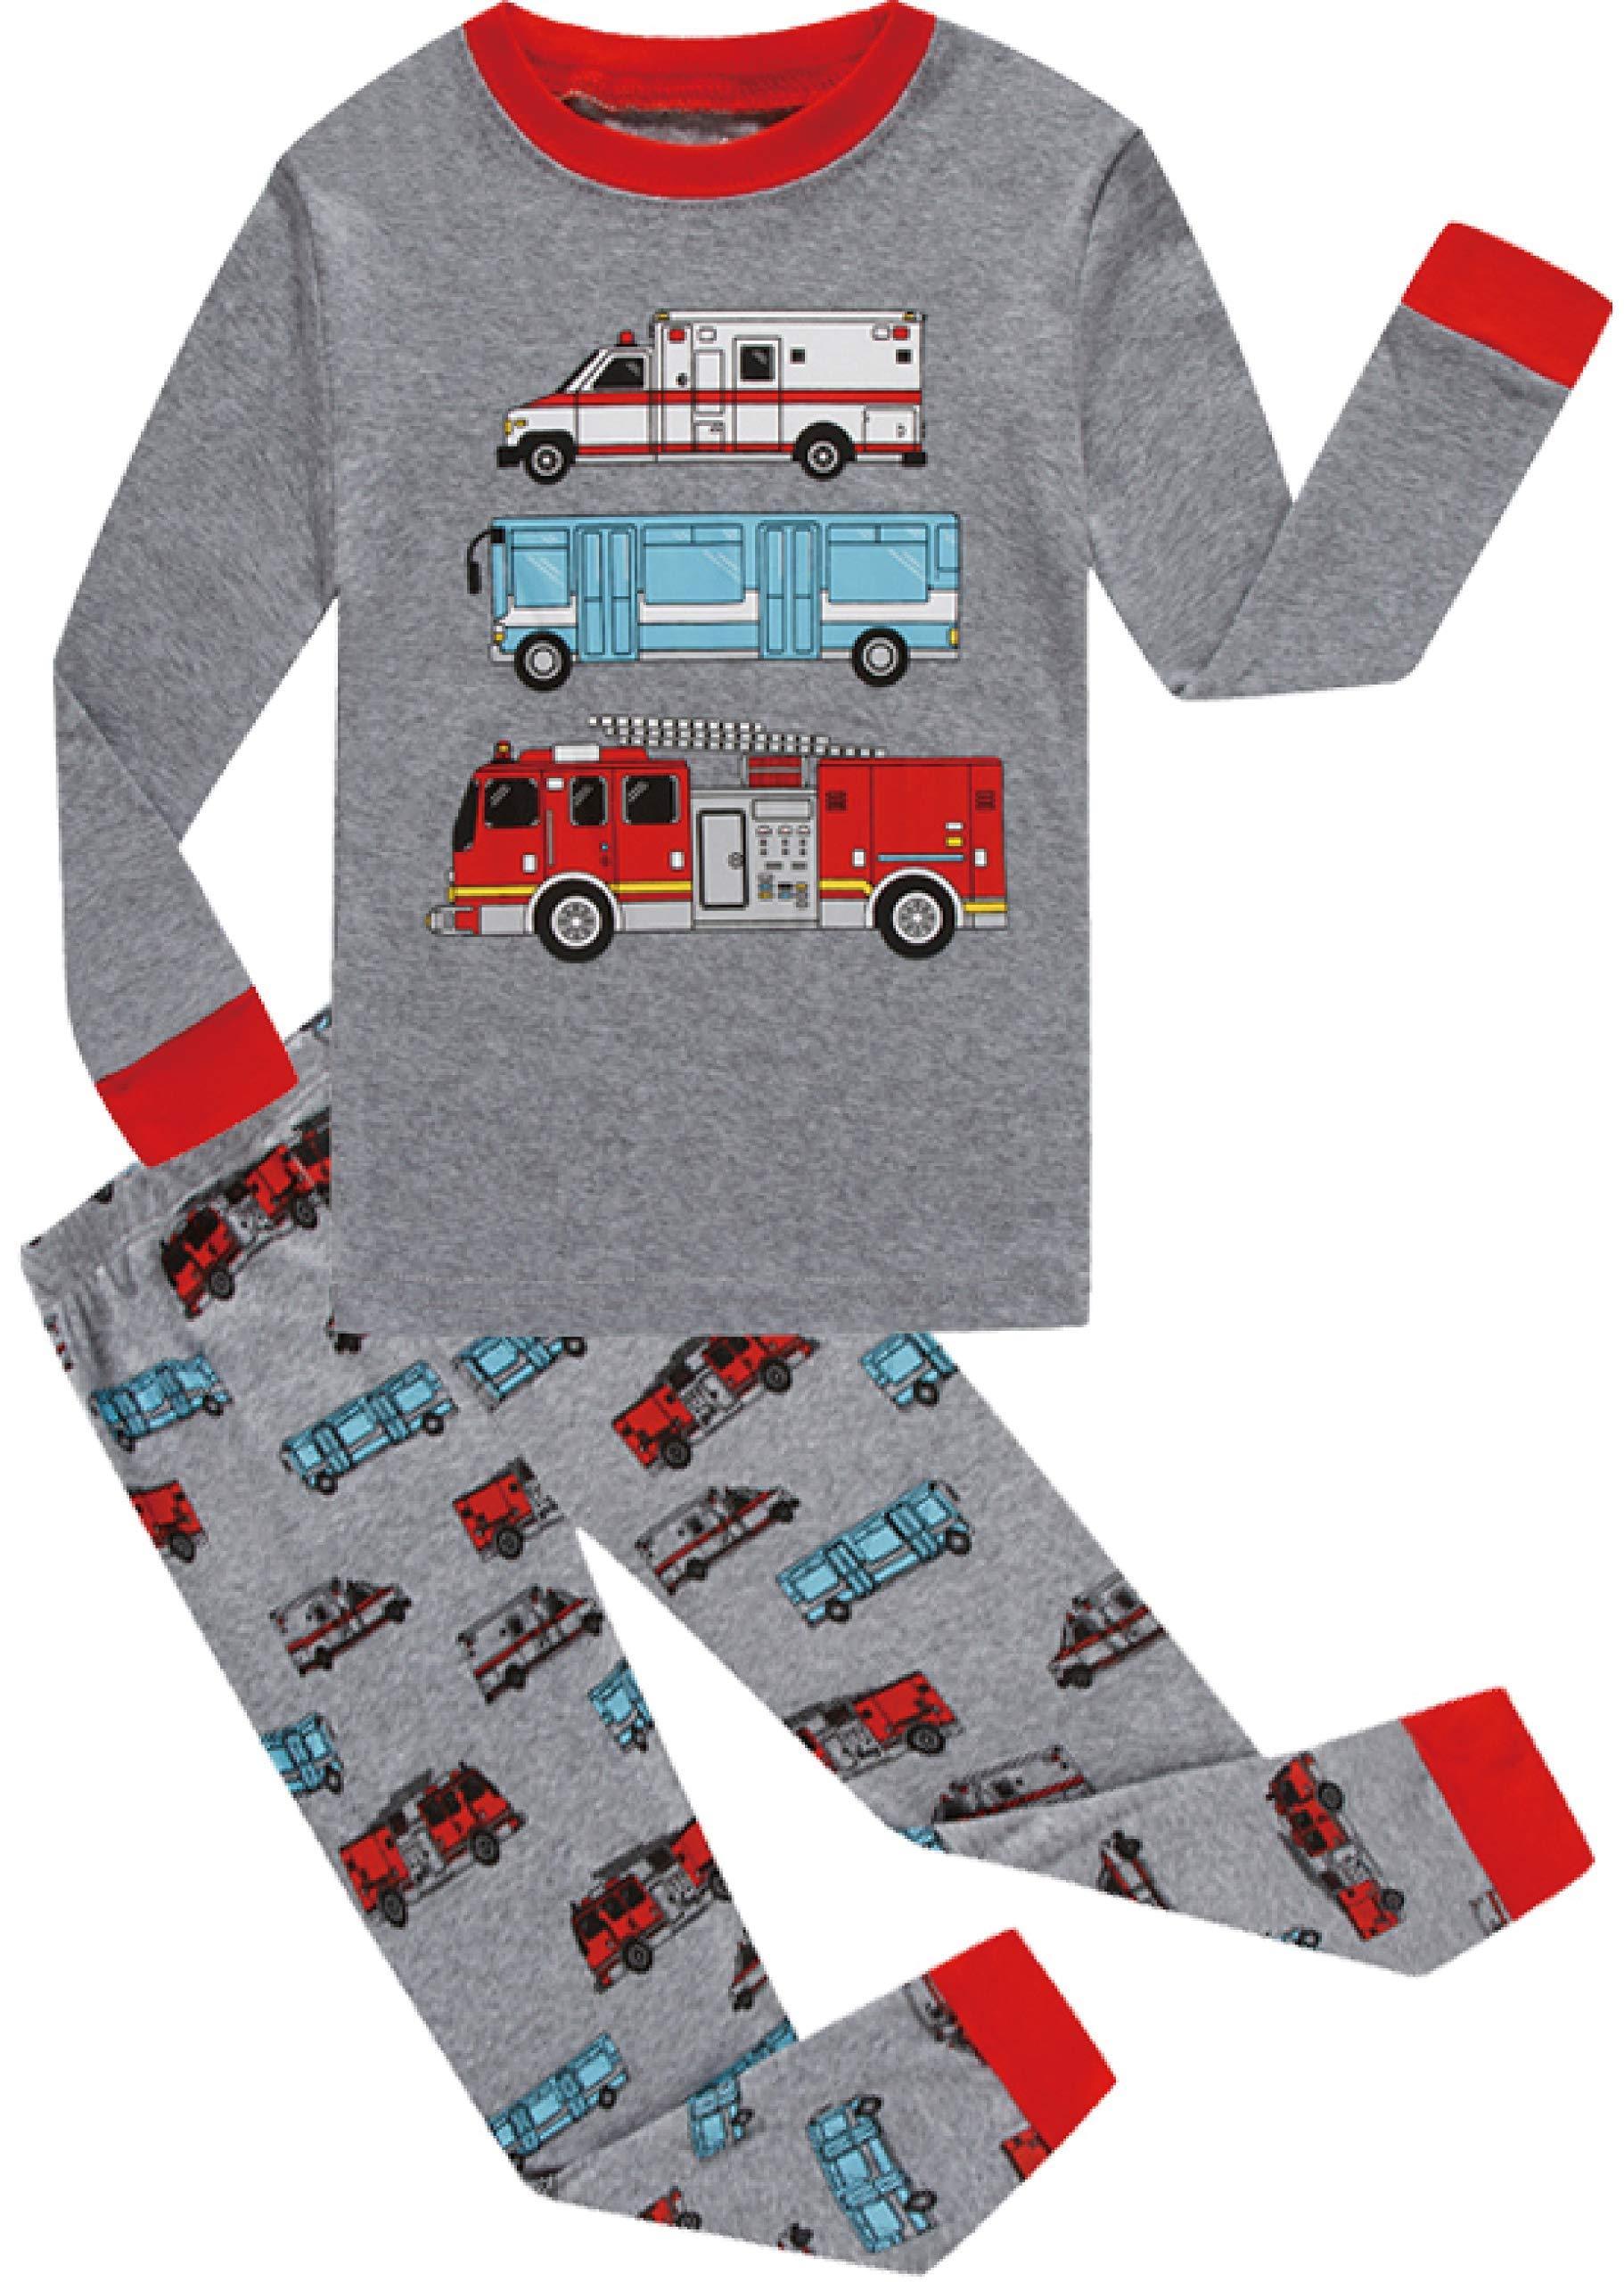 Boys Christmas Pajamas Set Toddle Car Cotton Sleepwear Kids Casual Wear 6t